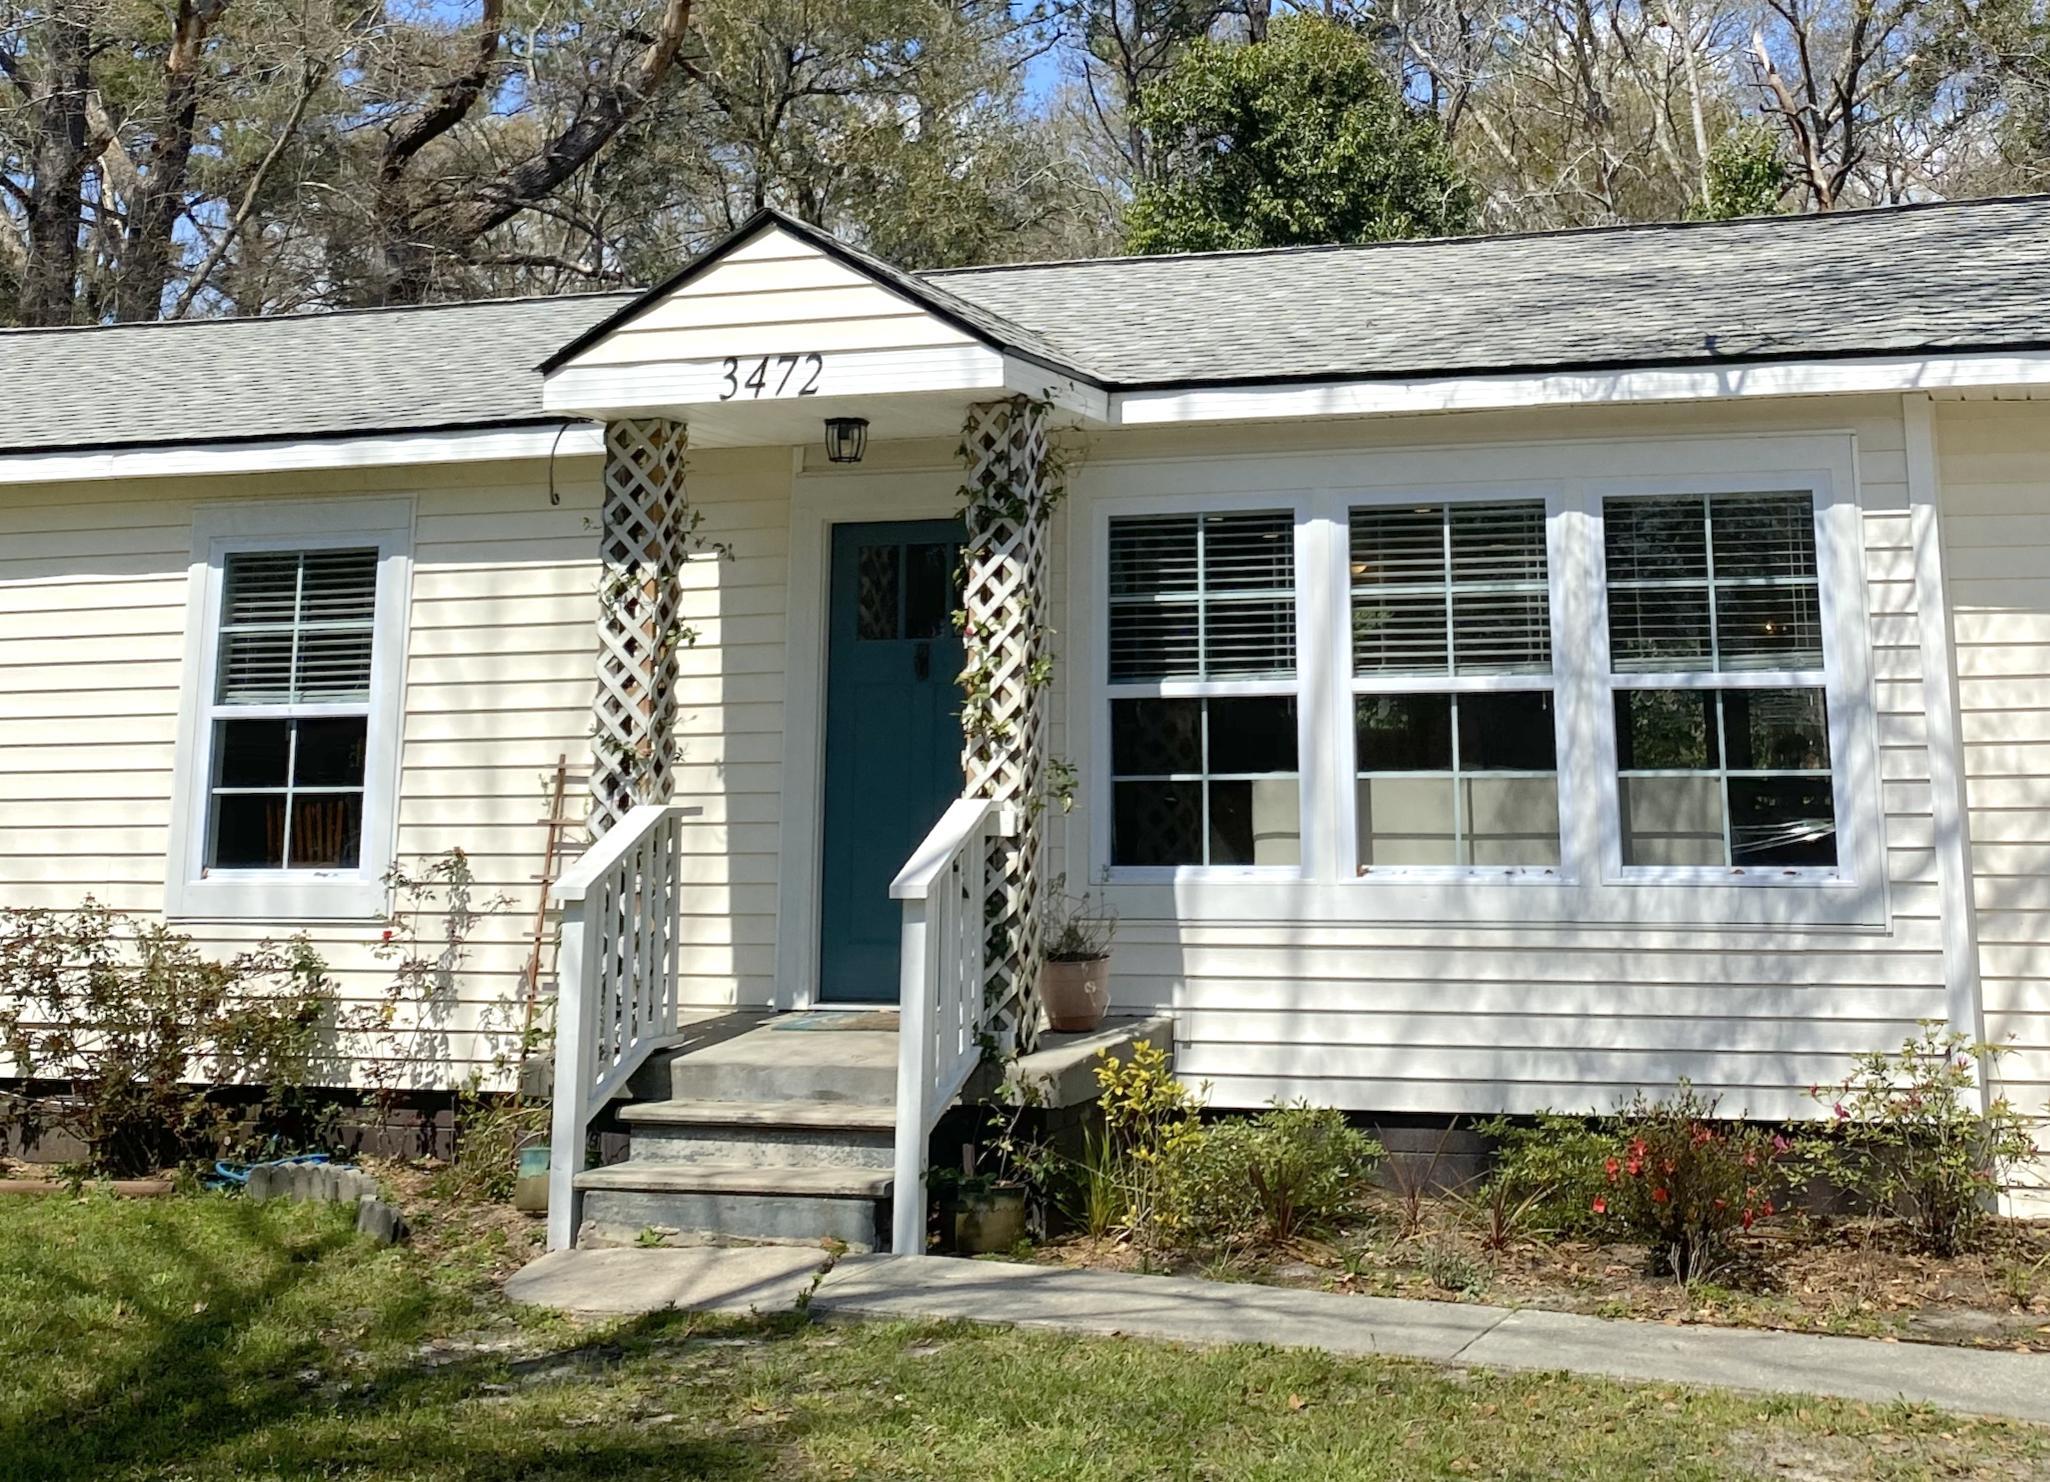 Stafford Heights Homes For Sale - 3472 Cynthia, Johns Island, SC - 21